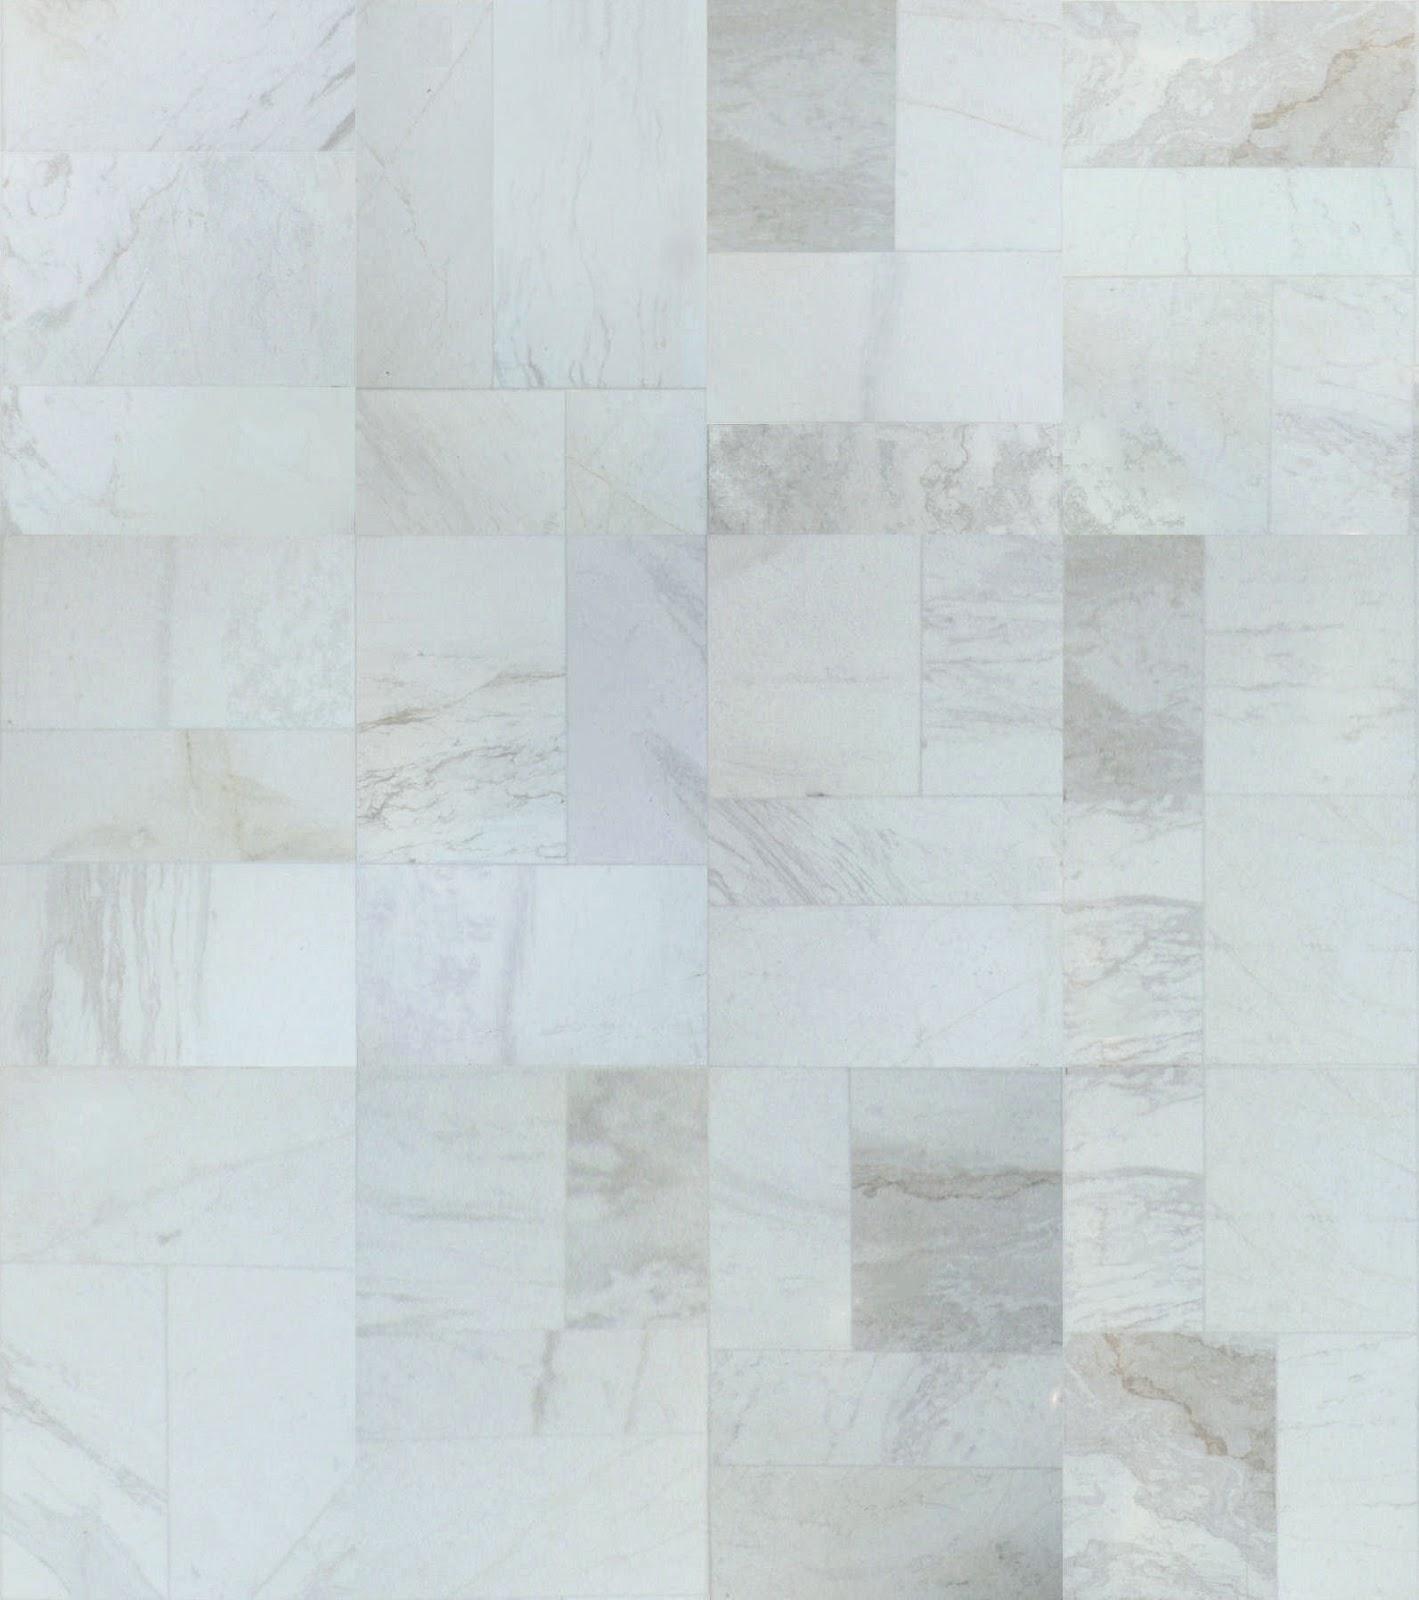 White Marble Floor Texture Gray White Marble Textures